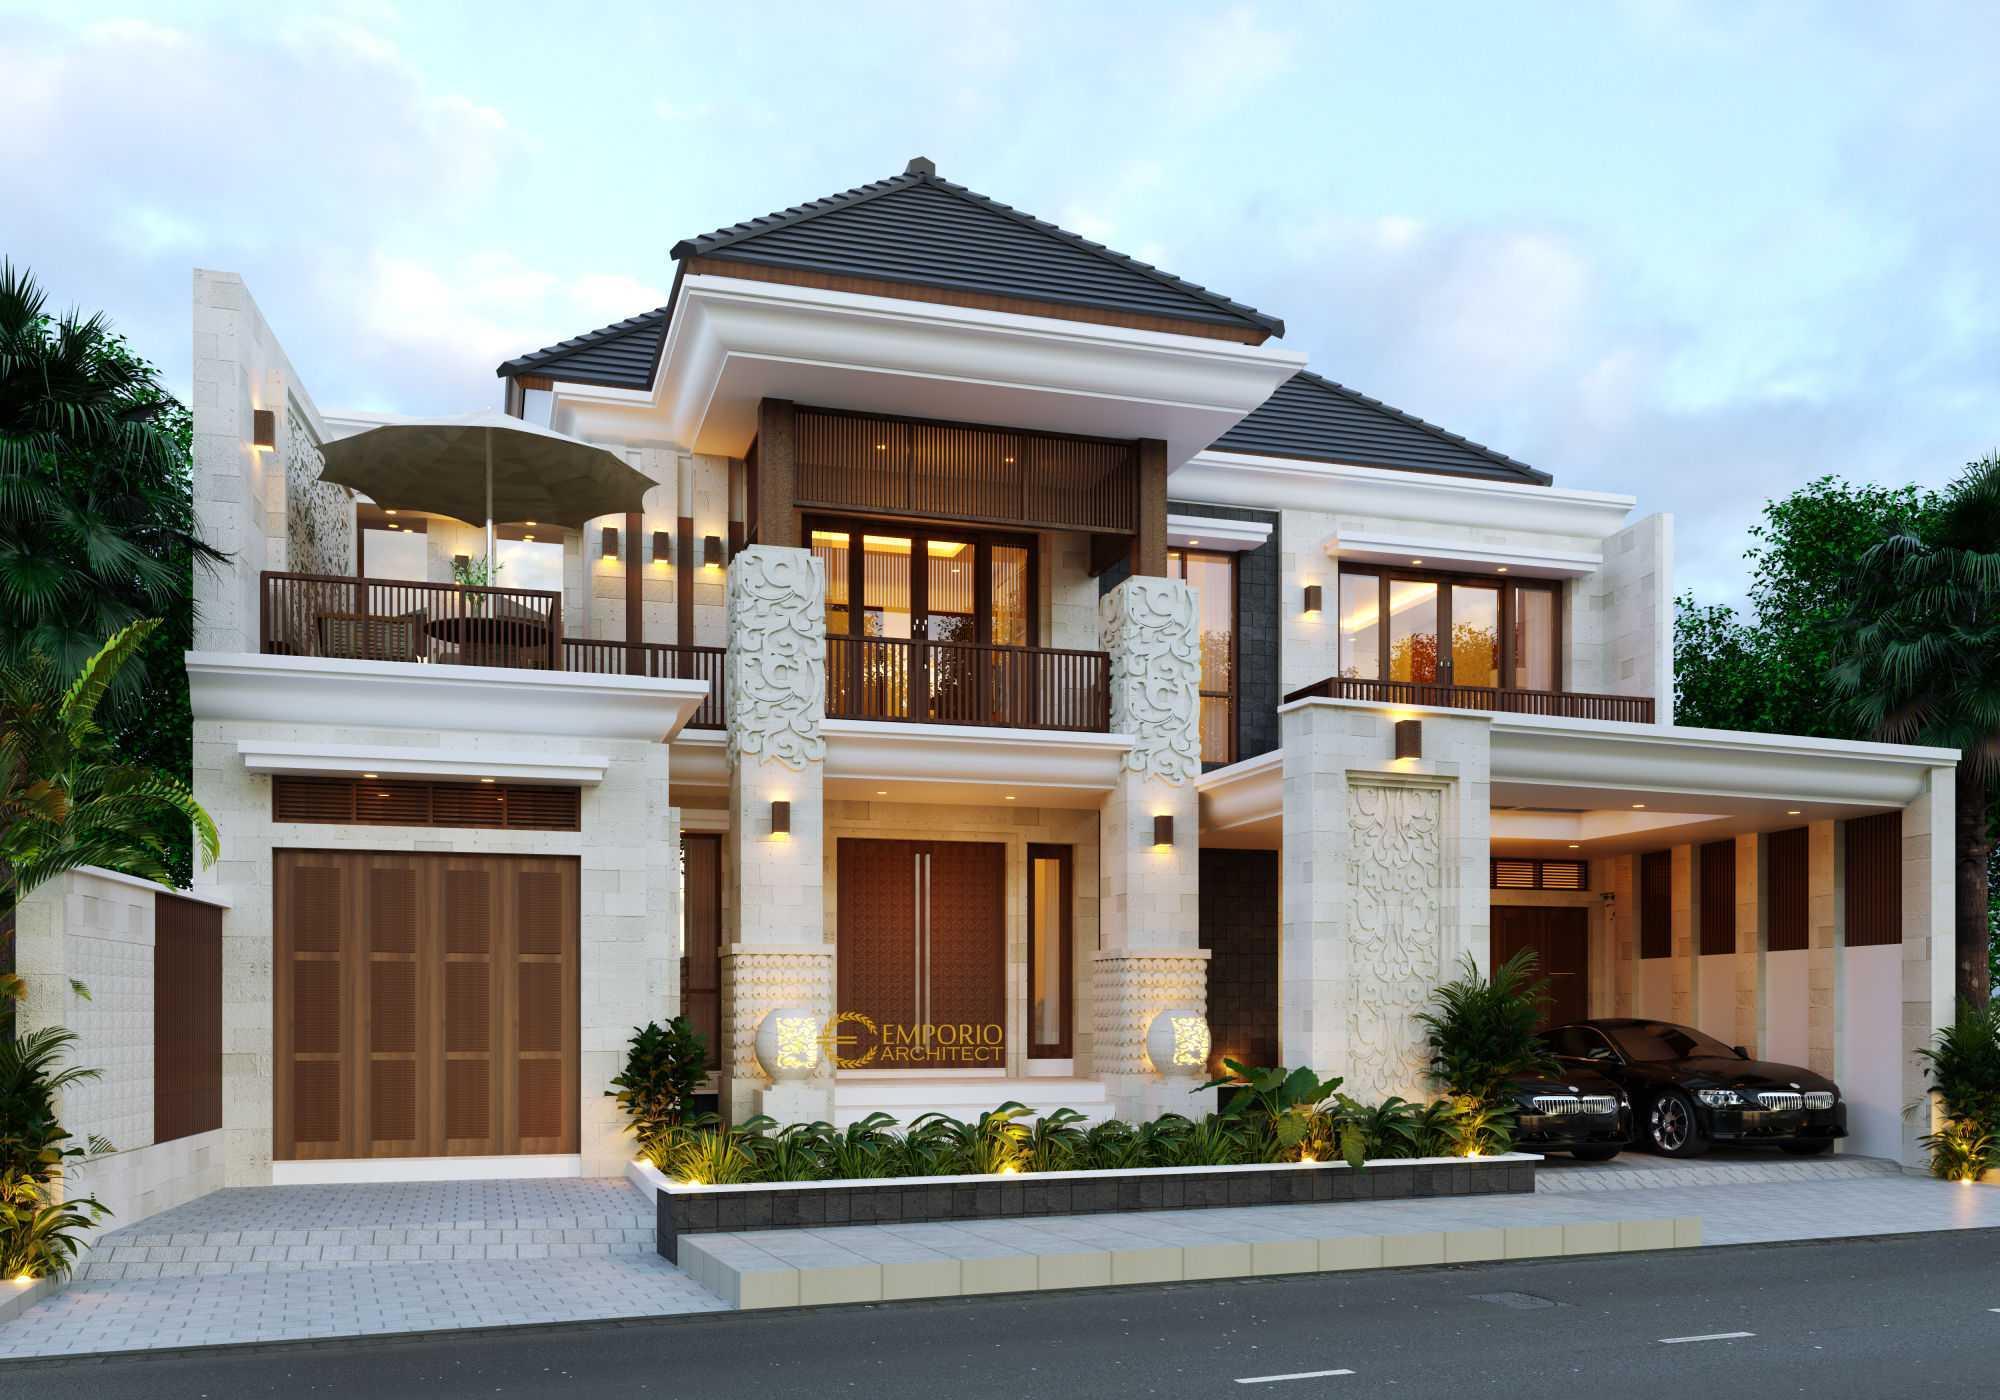 Emporio Architect Jasa Arsitek Makassar Desain Rumah Villa Bali Tropis 683 @ Makassar Makassar, Kota Makassar, Sulawesi Selatan, Indonesia Makassar, Kota Makassar, Sulawesi Selatan, Indonesia Emporio-Architect-Jasa-Arsitek-Makassar-Desain-Rumah-Villa-Bali-Tropis-683-Makassar Tropical 81773